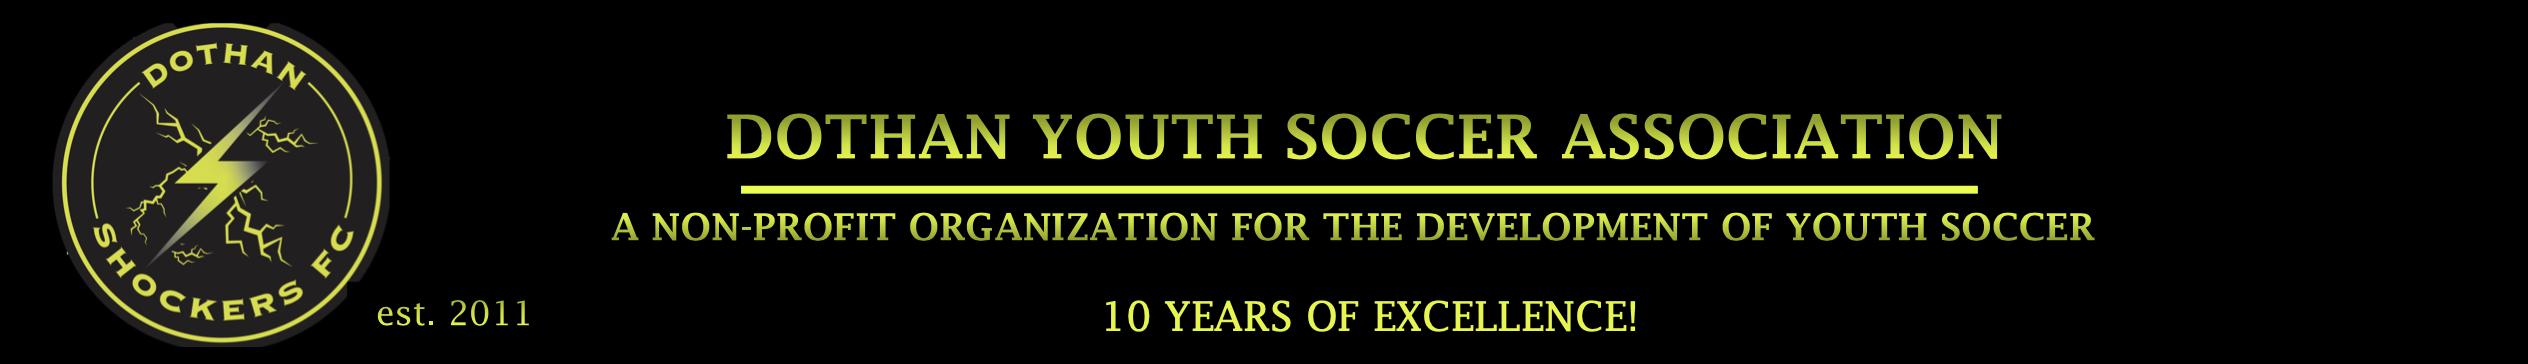 Dothan Youth Soccer Association, Soccer, Goal, Field